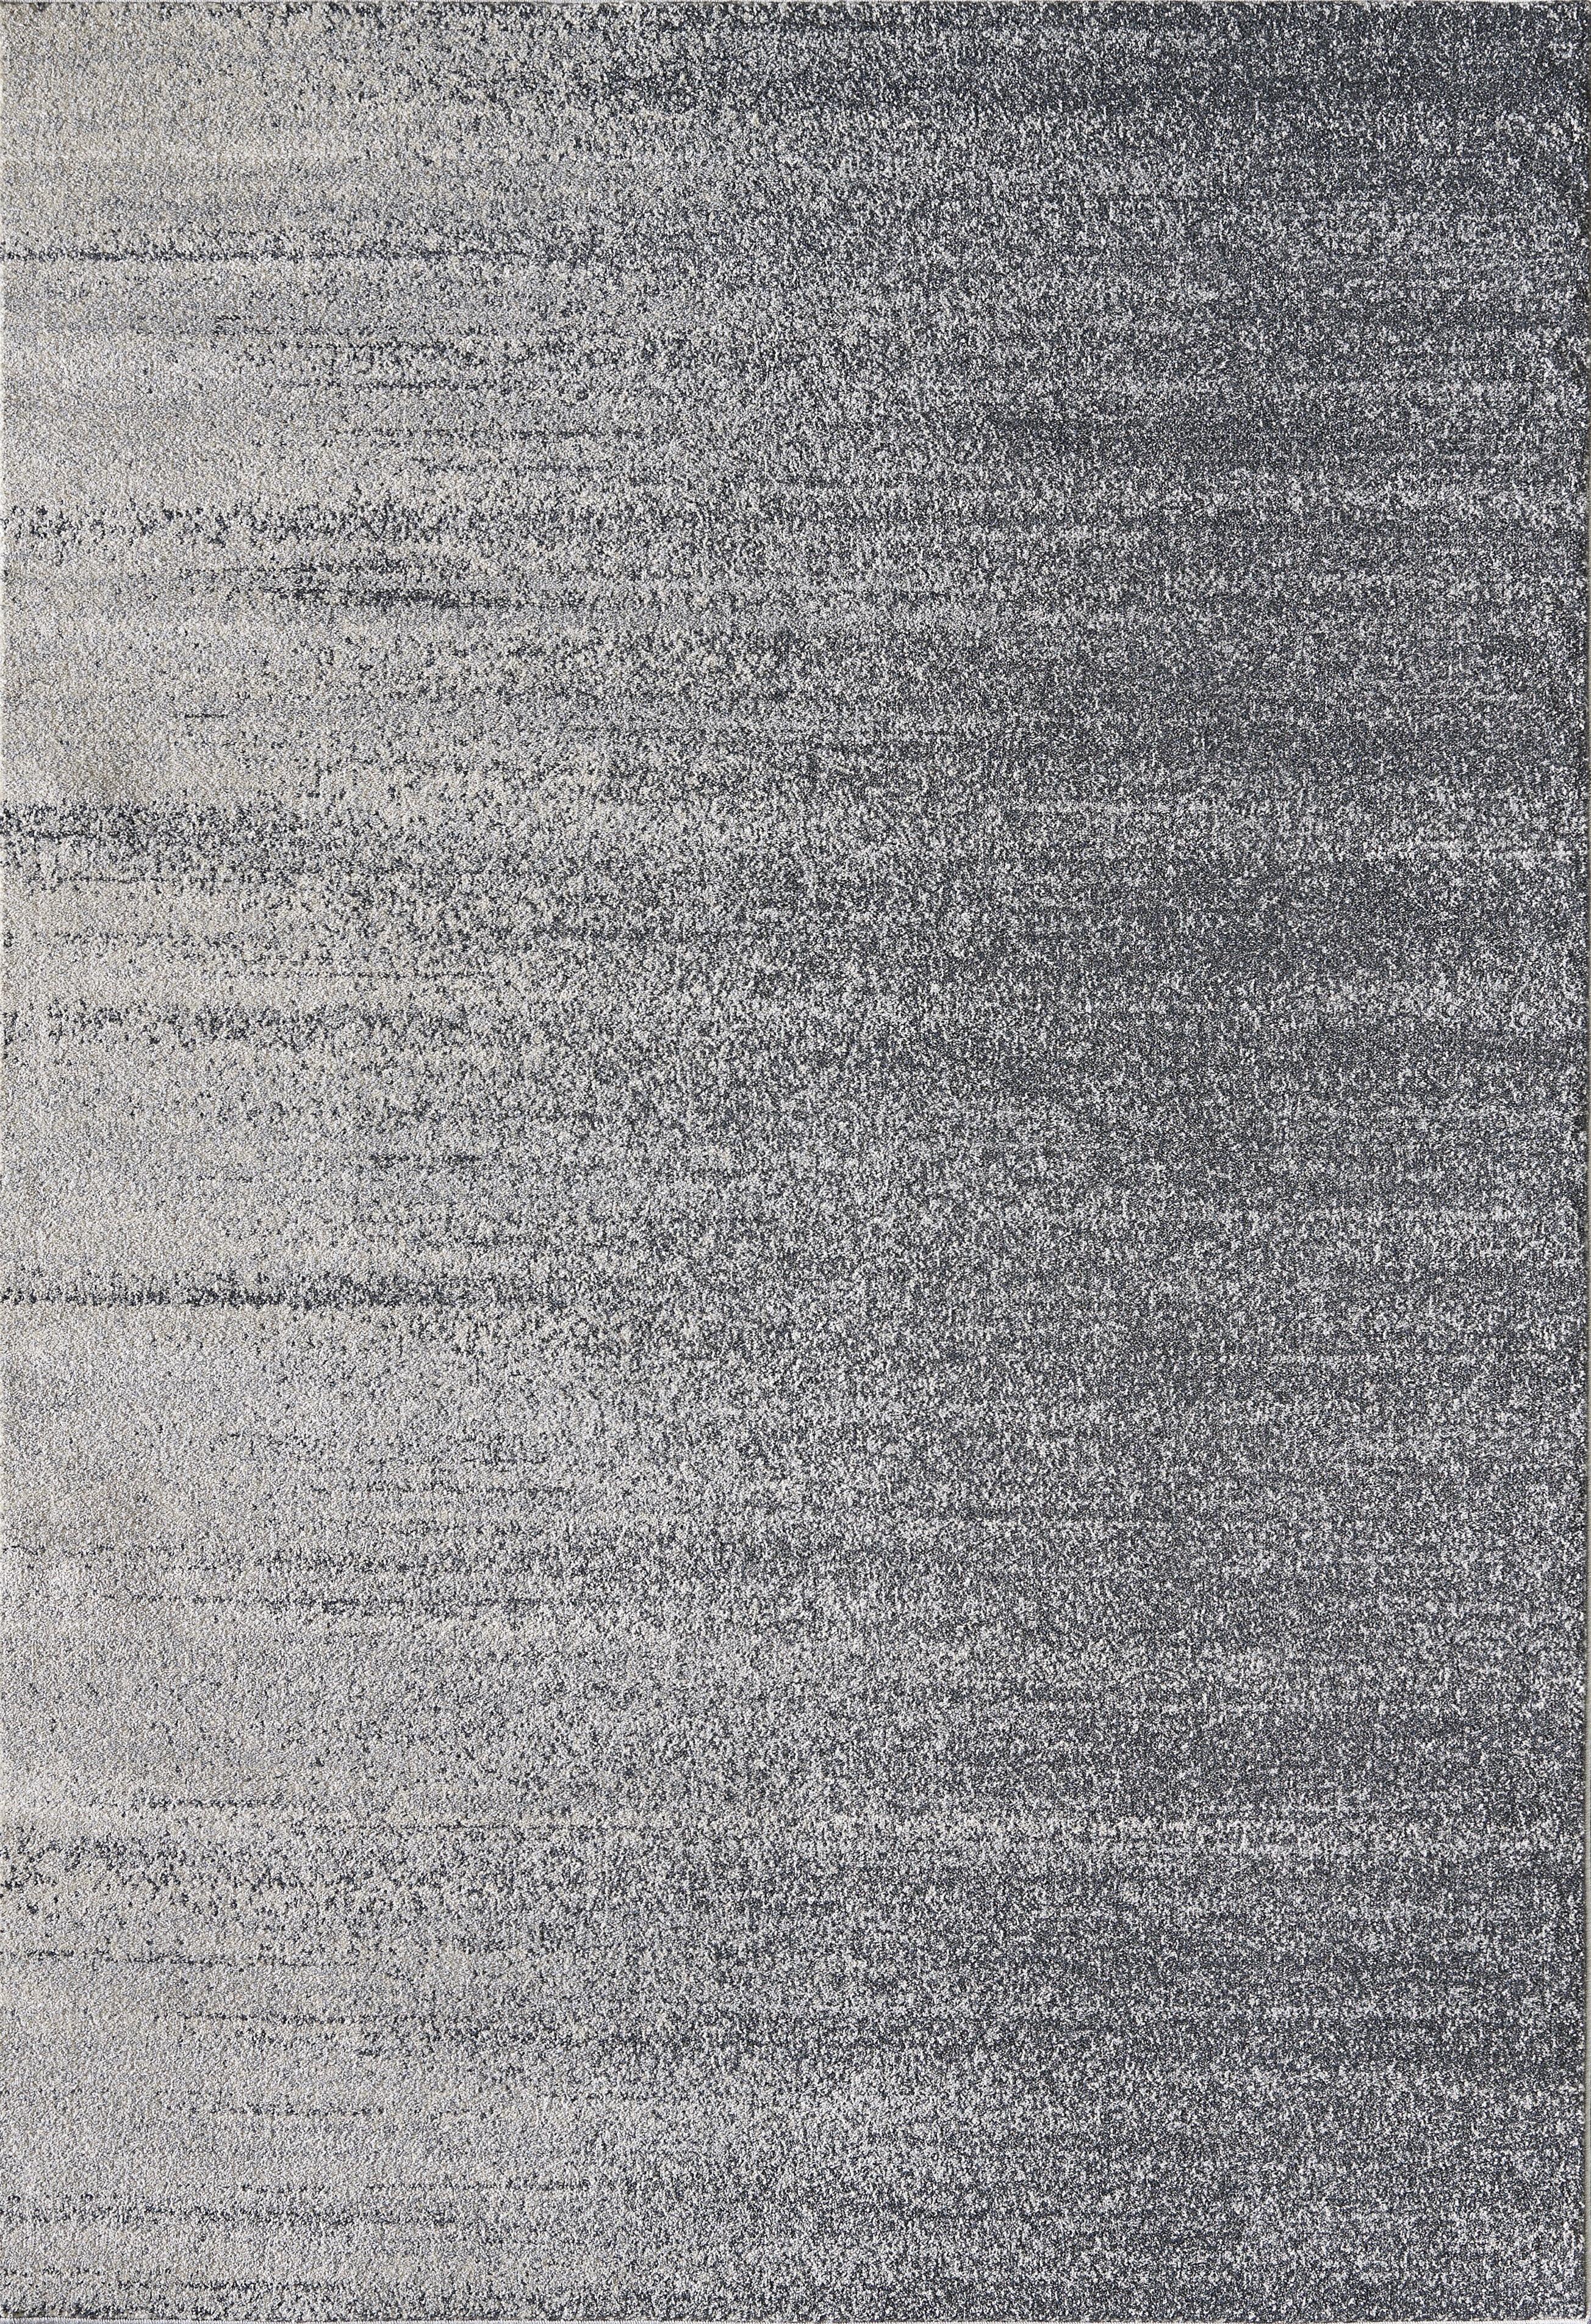 Orren Ellis Sumter Abstract Gray Area Rug Reviews Wayfair